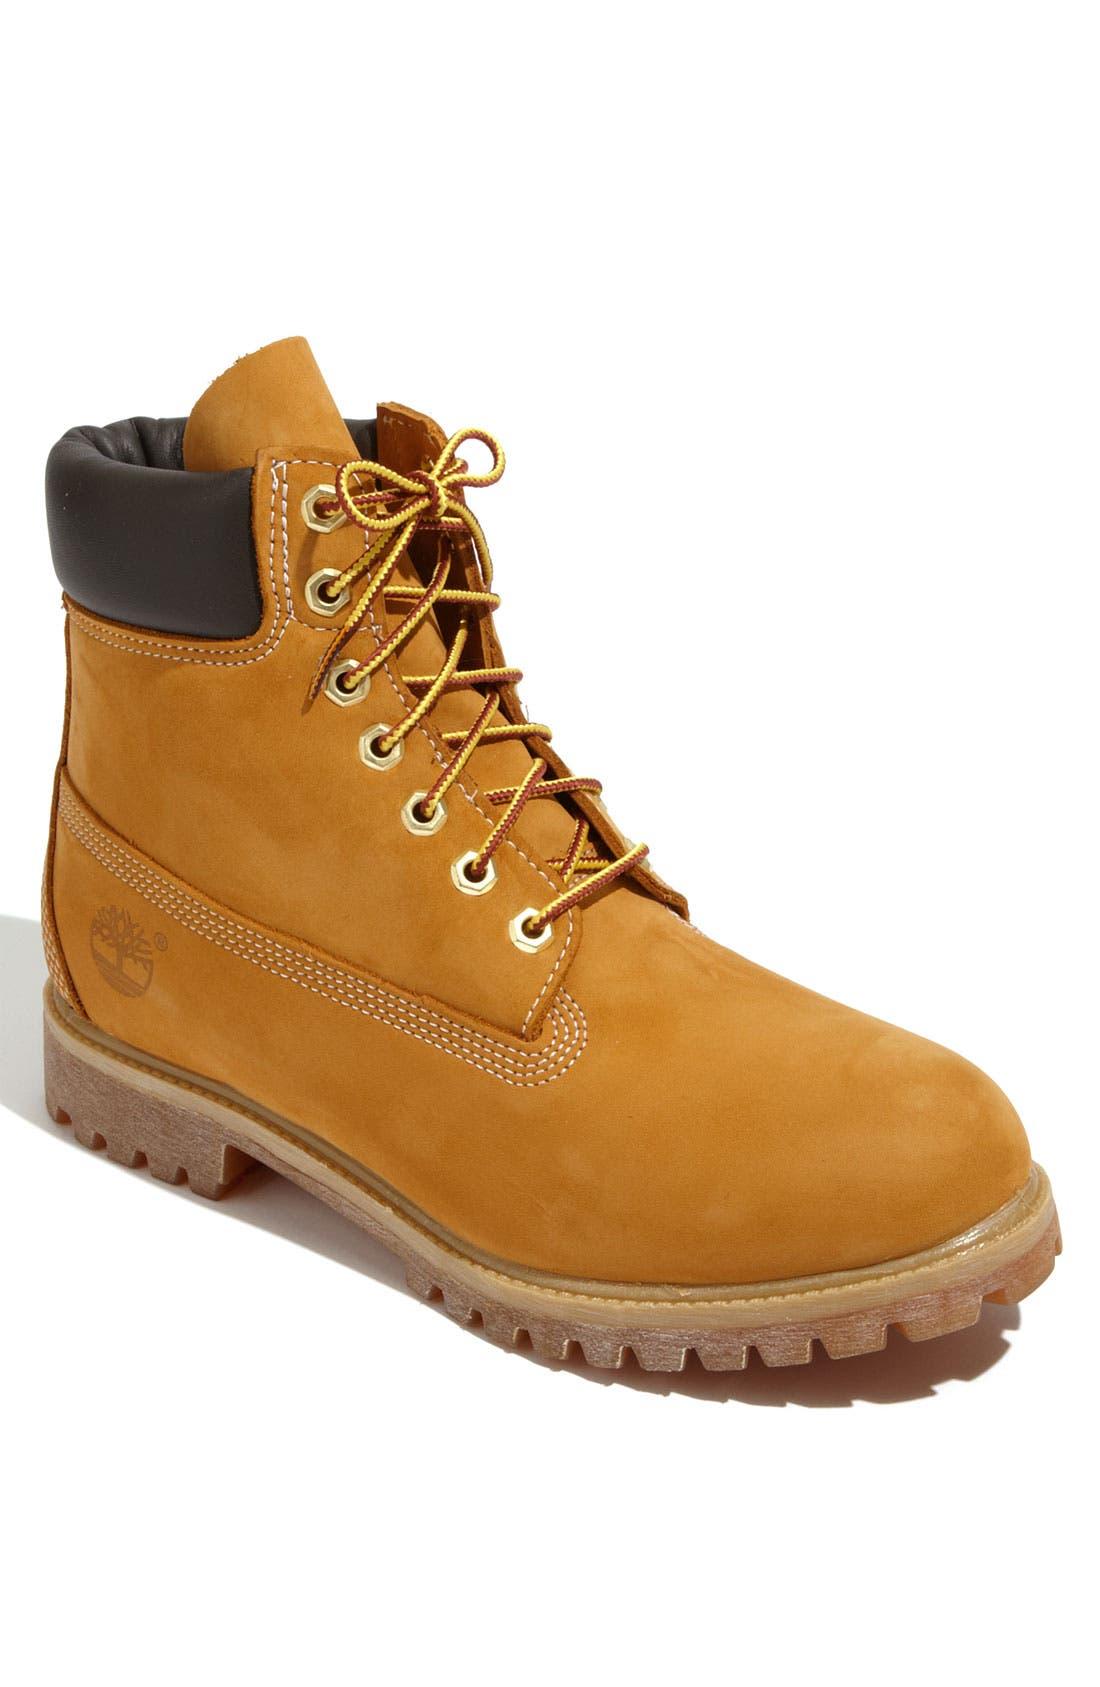 Main Image - Timberland 'Six Inch Classic Boots Series - Premium' Boot